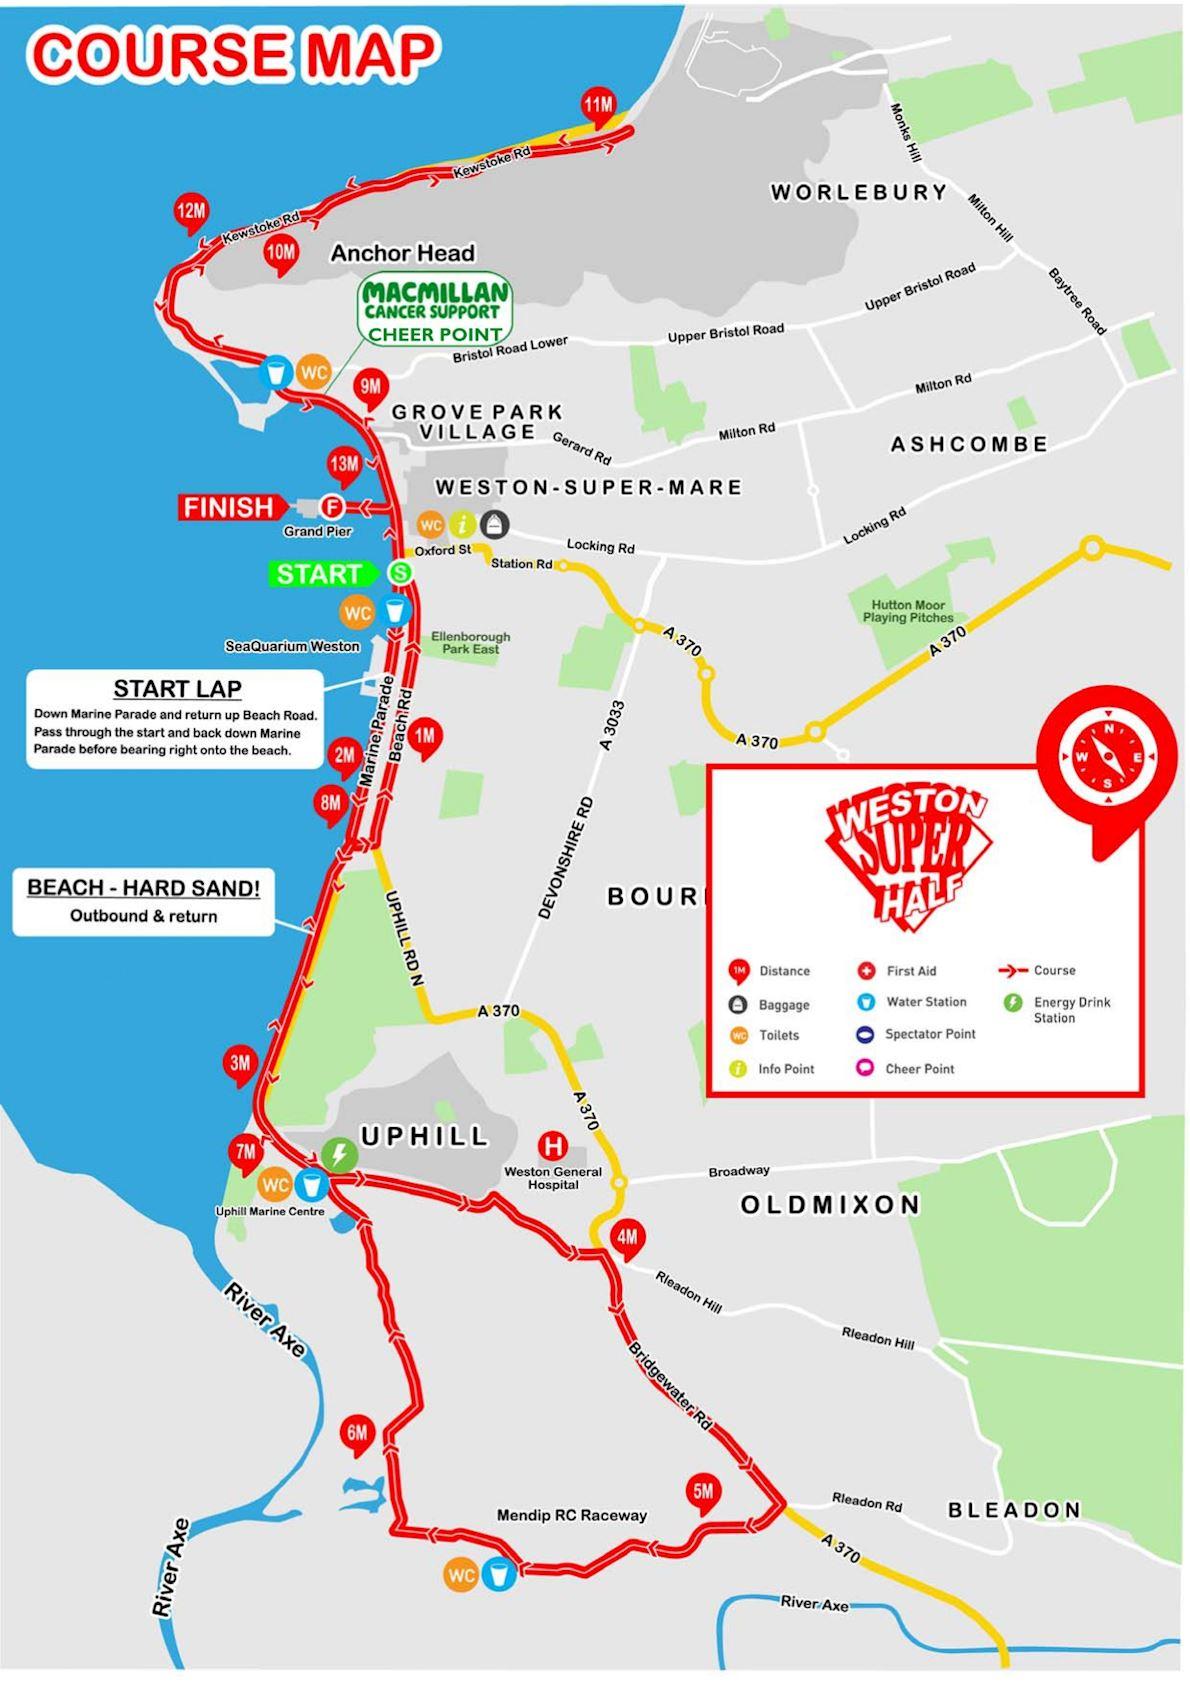 Weston Super Half Route Map